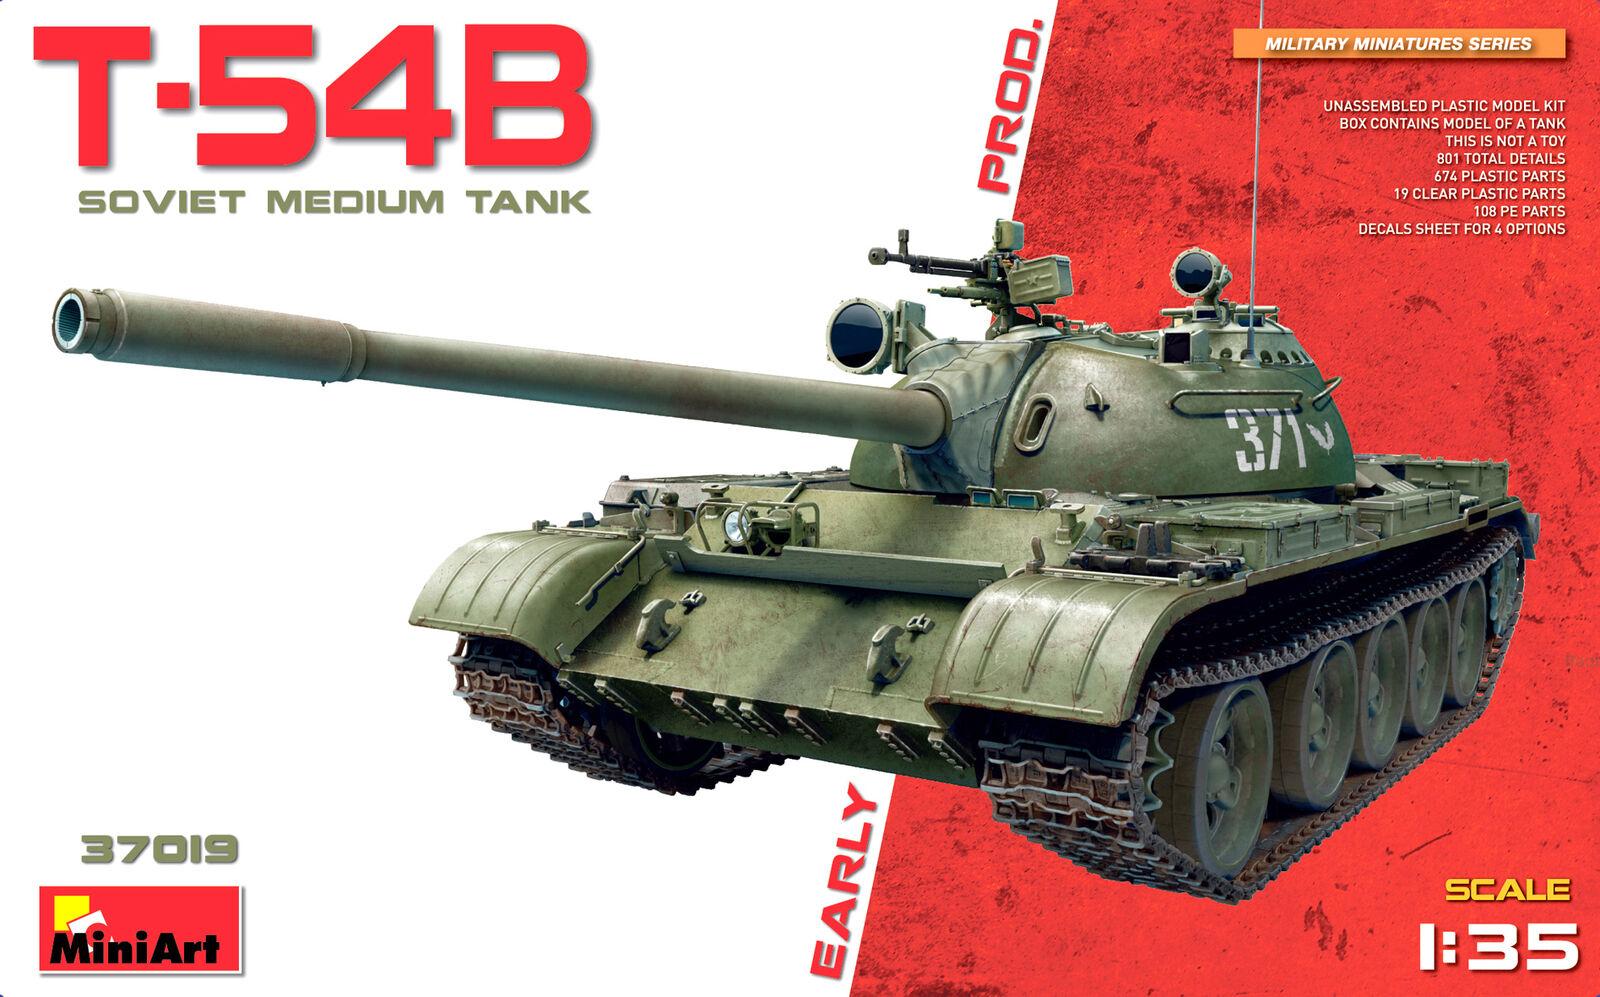 Miniart 1 35 T-54B Soviet Medium Tank Early Production